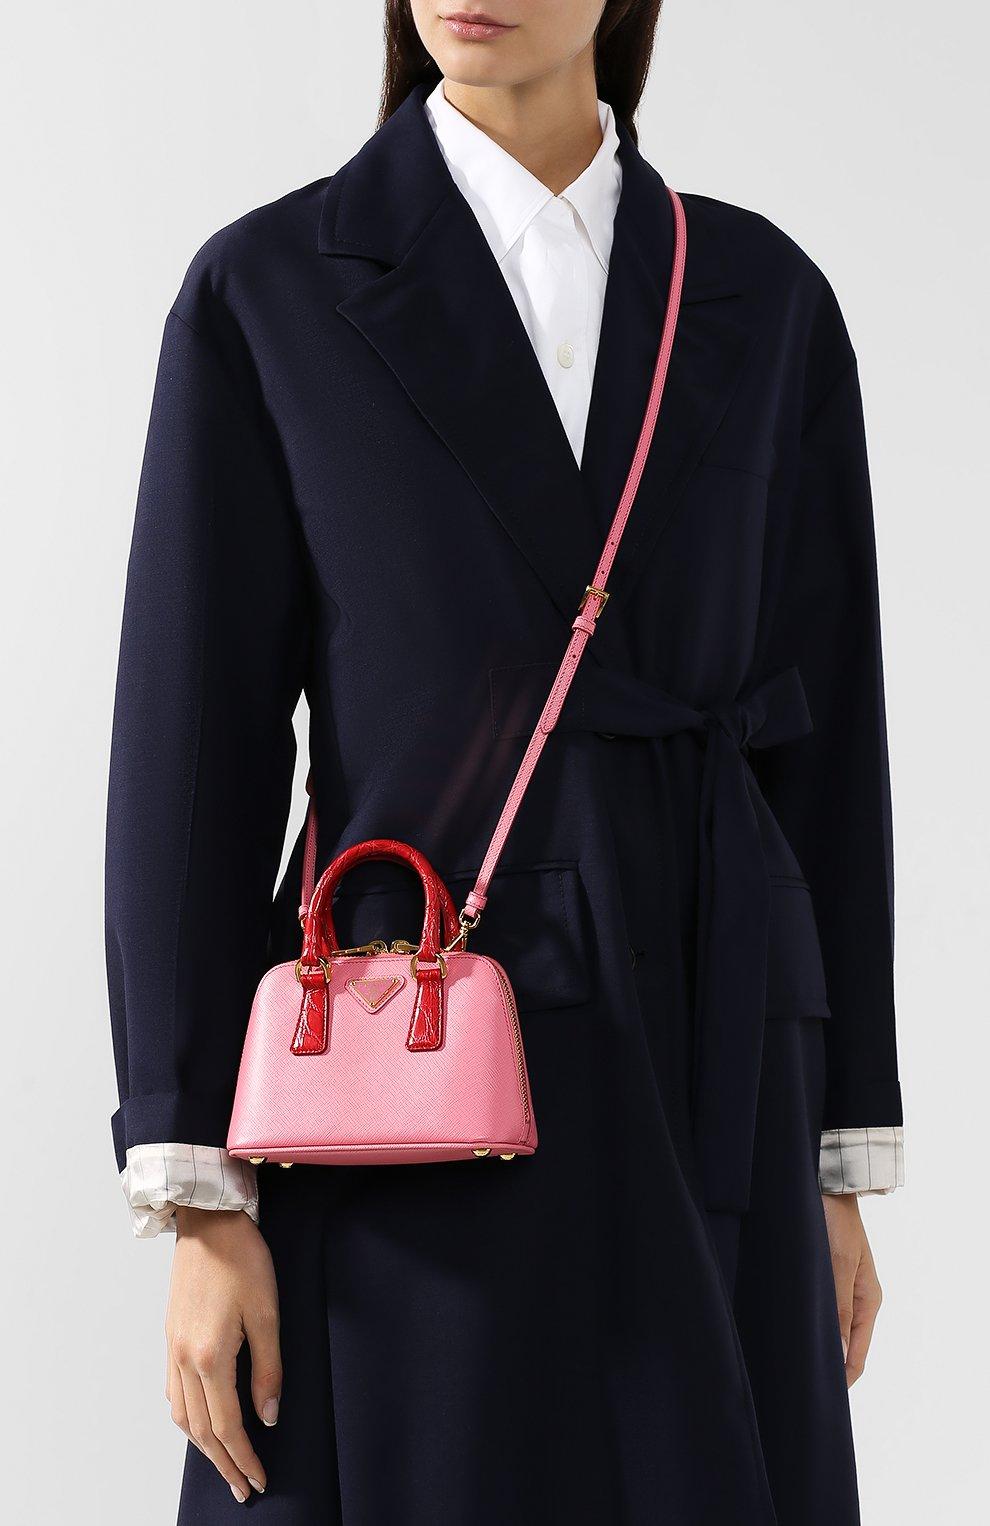 90a78cd59823 Сумка-тоут Mini Promenade Prada розовая цвета | Фото №5